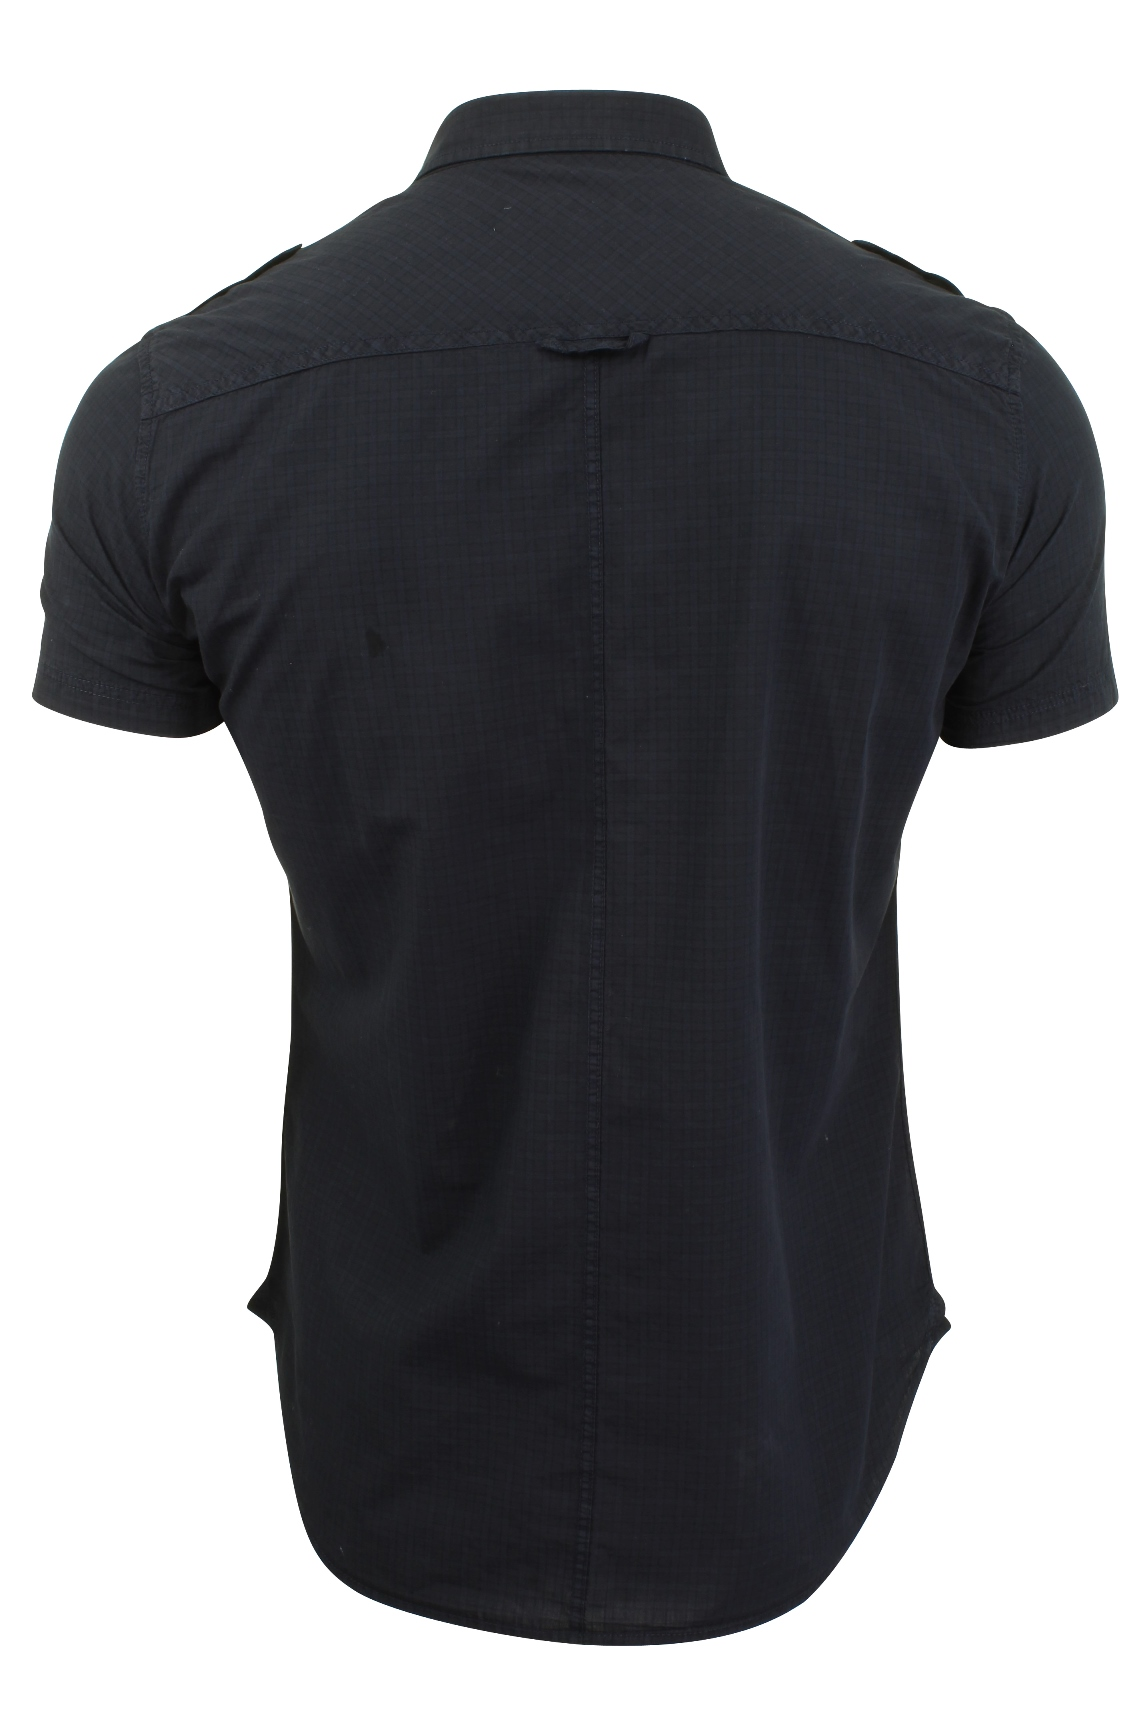 Mens-Short-Sleeved-Shirt-by-Firetrap thumbnail 26